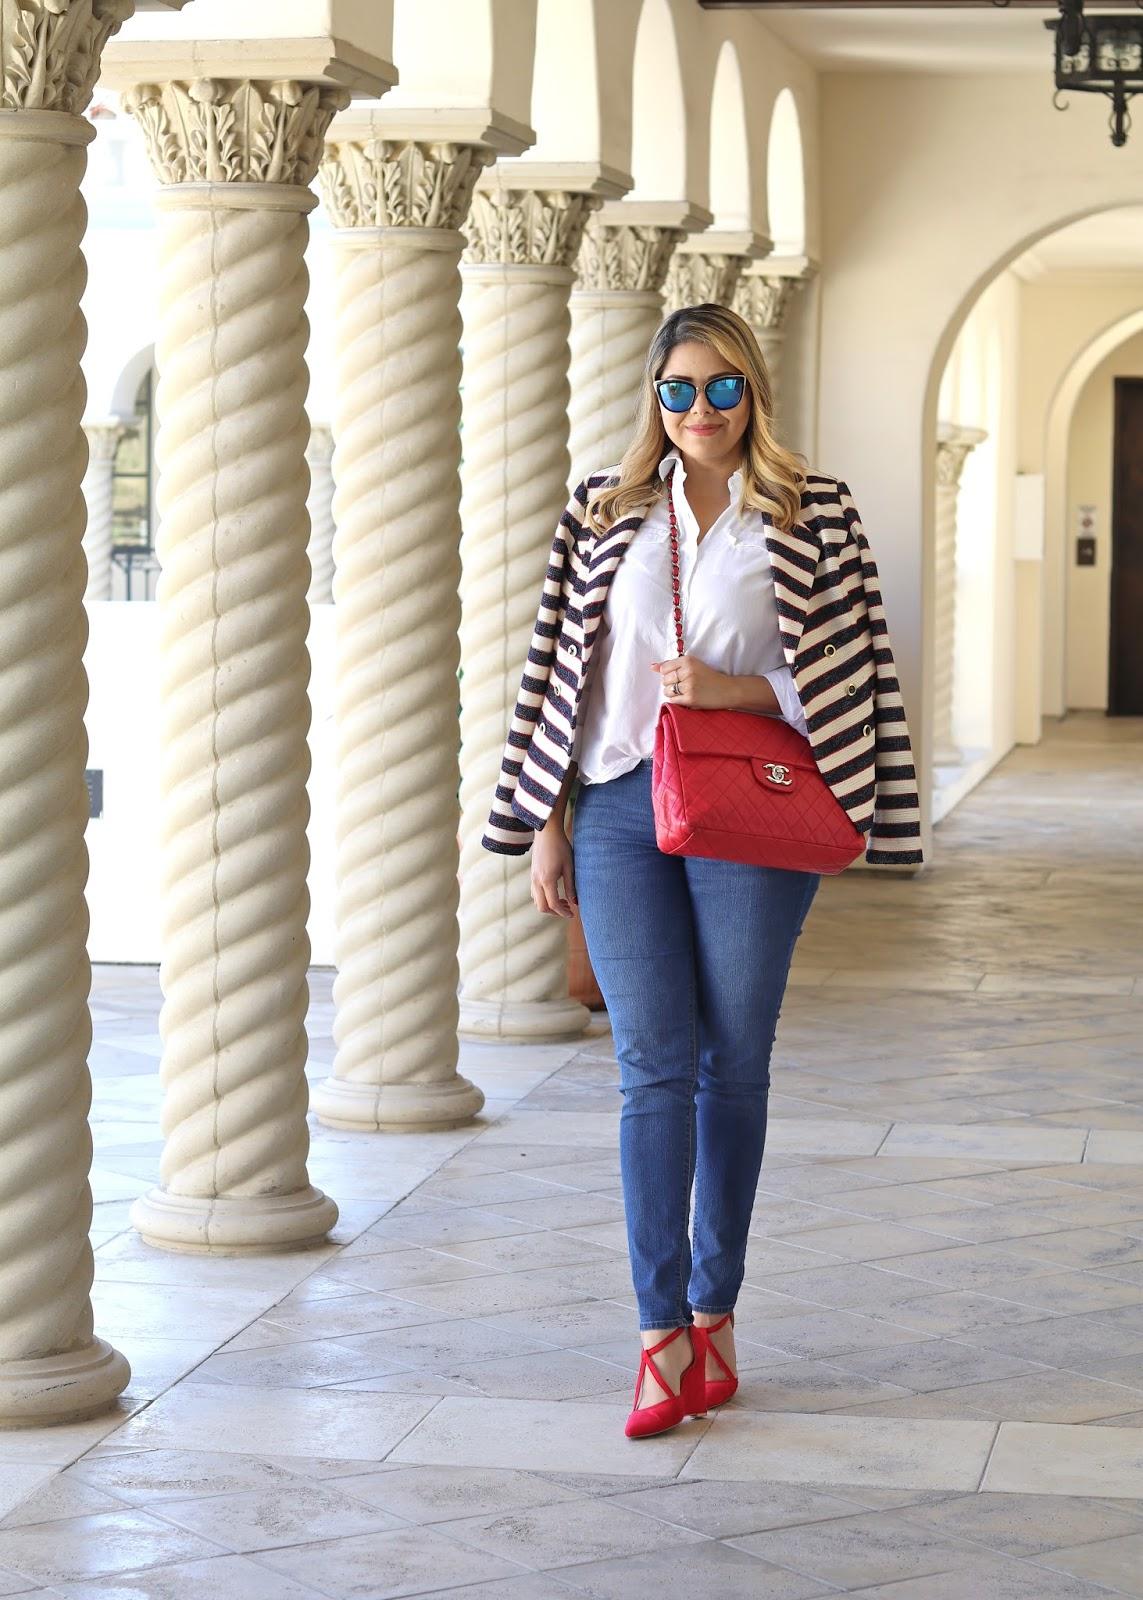 socal fashion blogger, socal blogger, latina fashion blogger, mexican fashion blogger